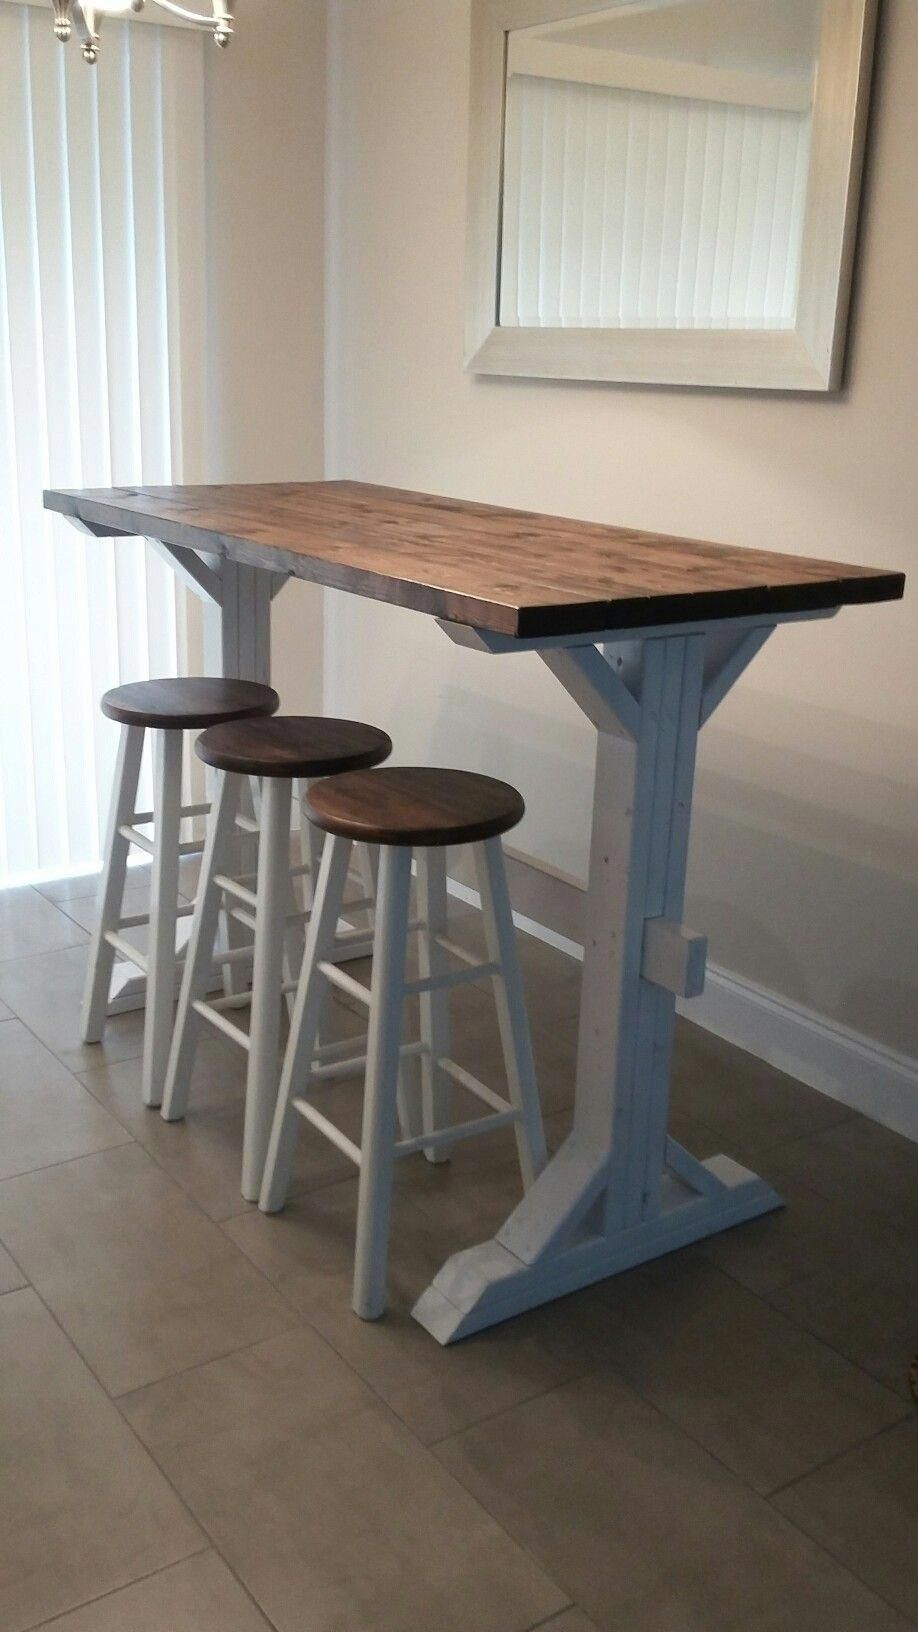 Farmhouse style bar height table barfurniture Kitchen